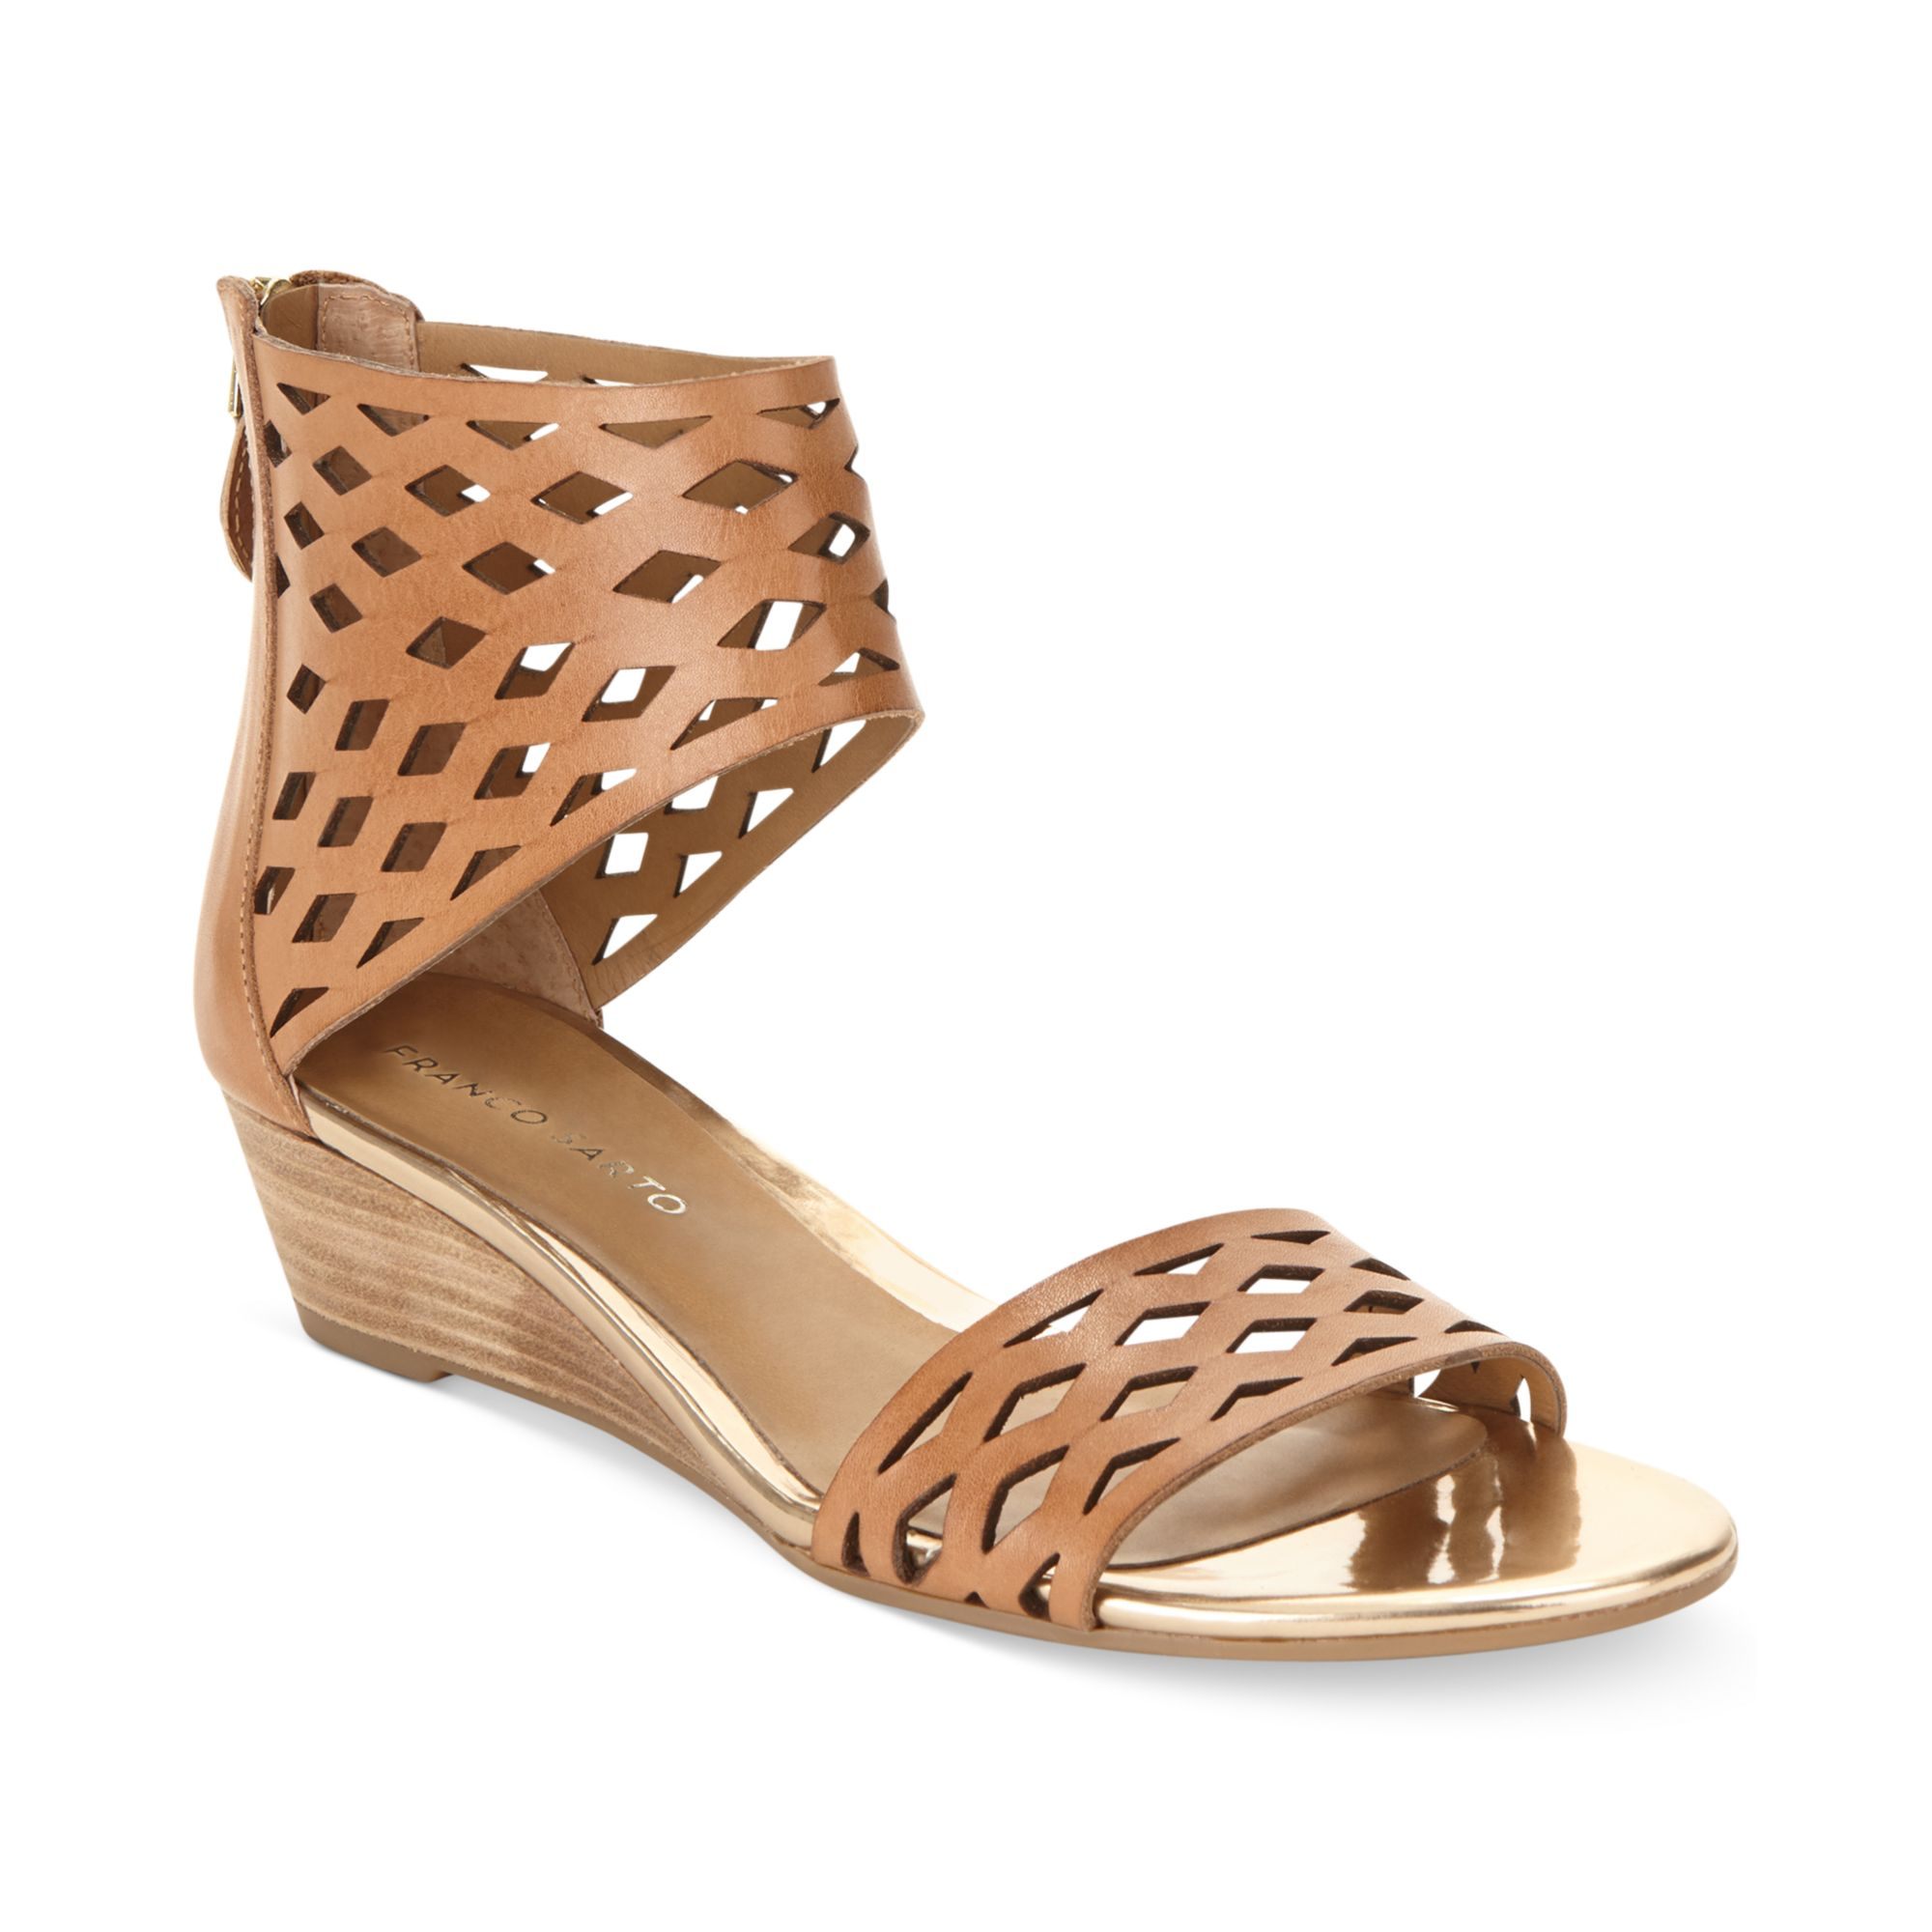 Fashion ankle cuff sandals M US Shoes, Boots, Sandals, Handbags